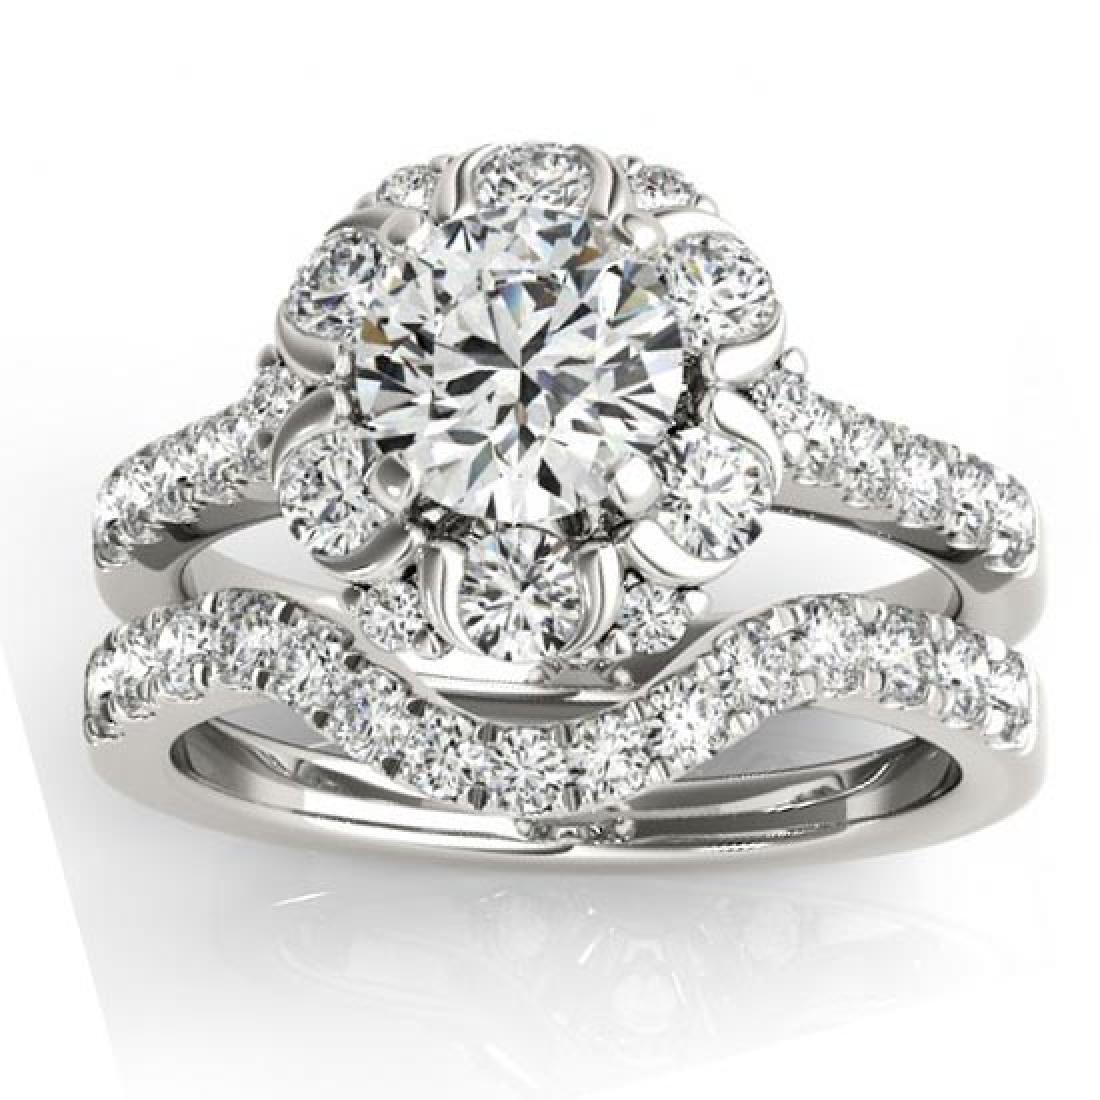 Flower Halo Diamond Bridal Set 14k White Gold 1.91ct